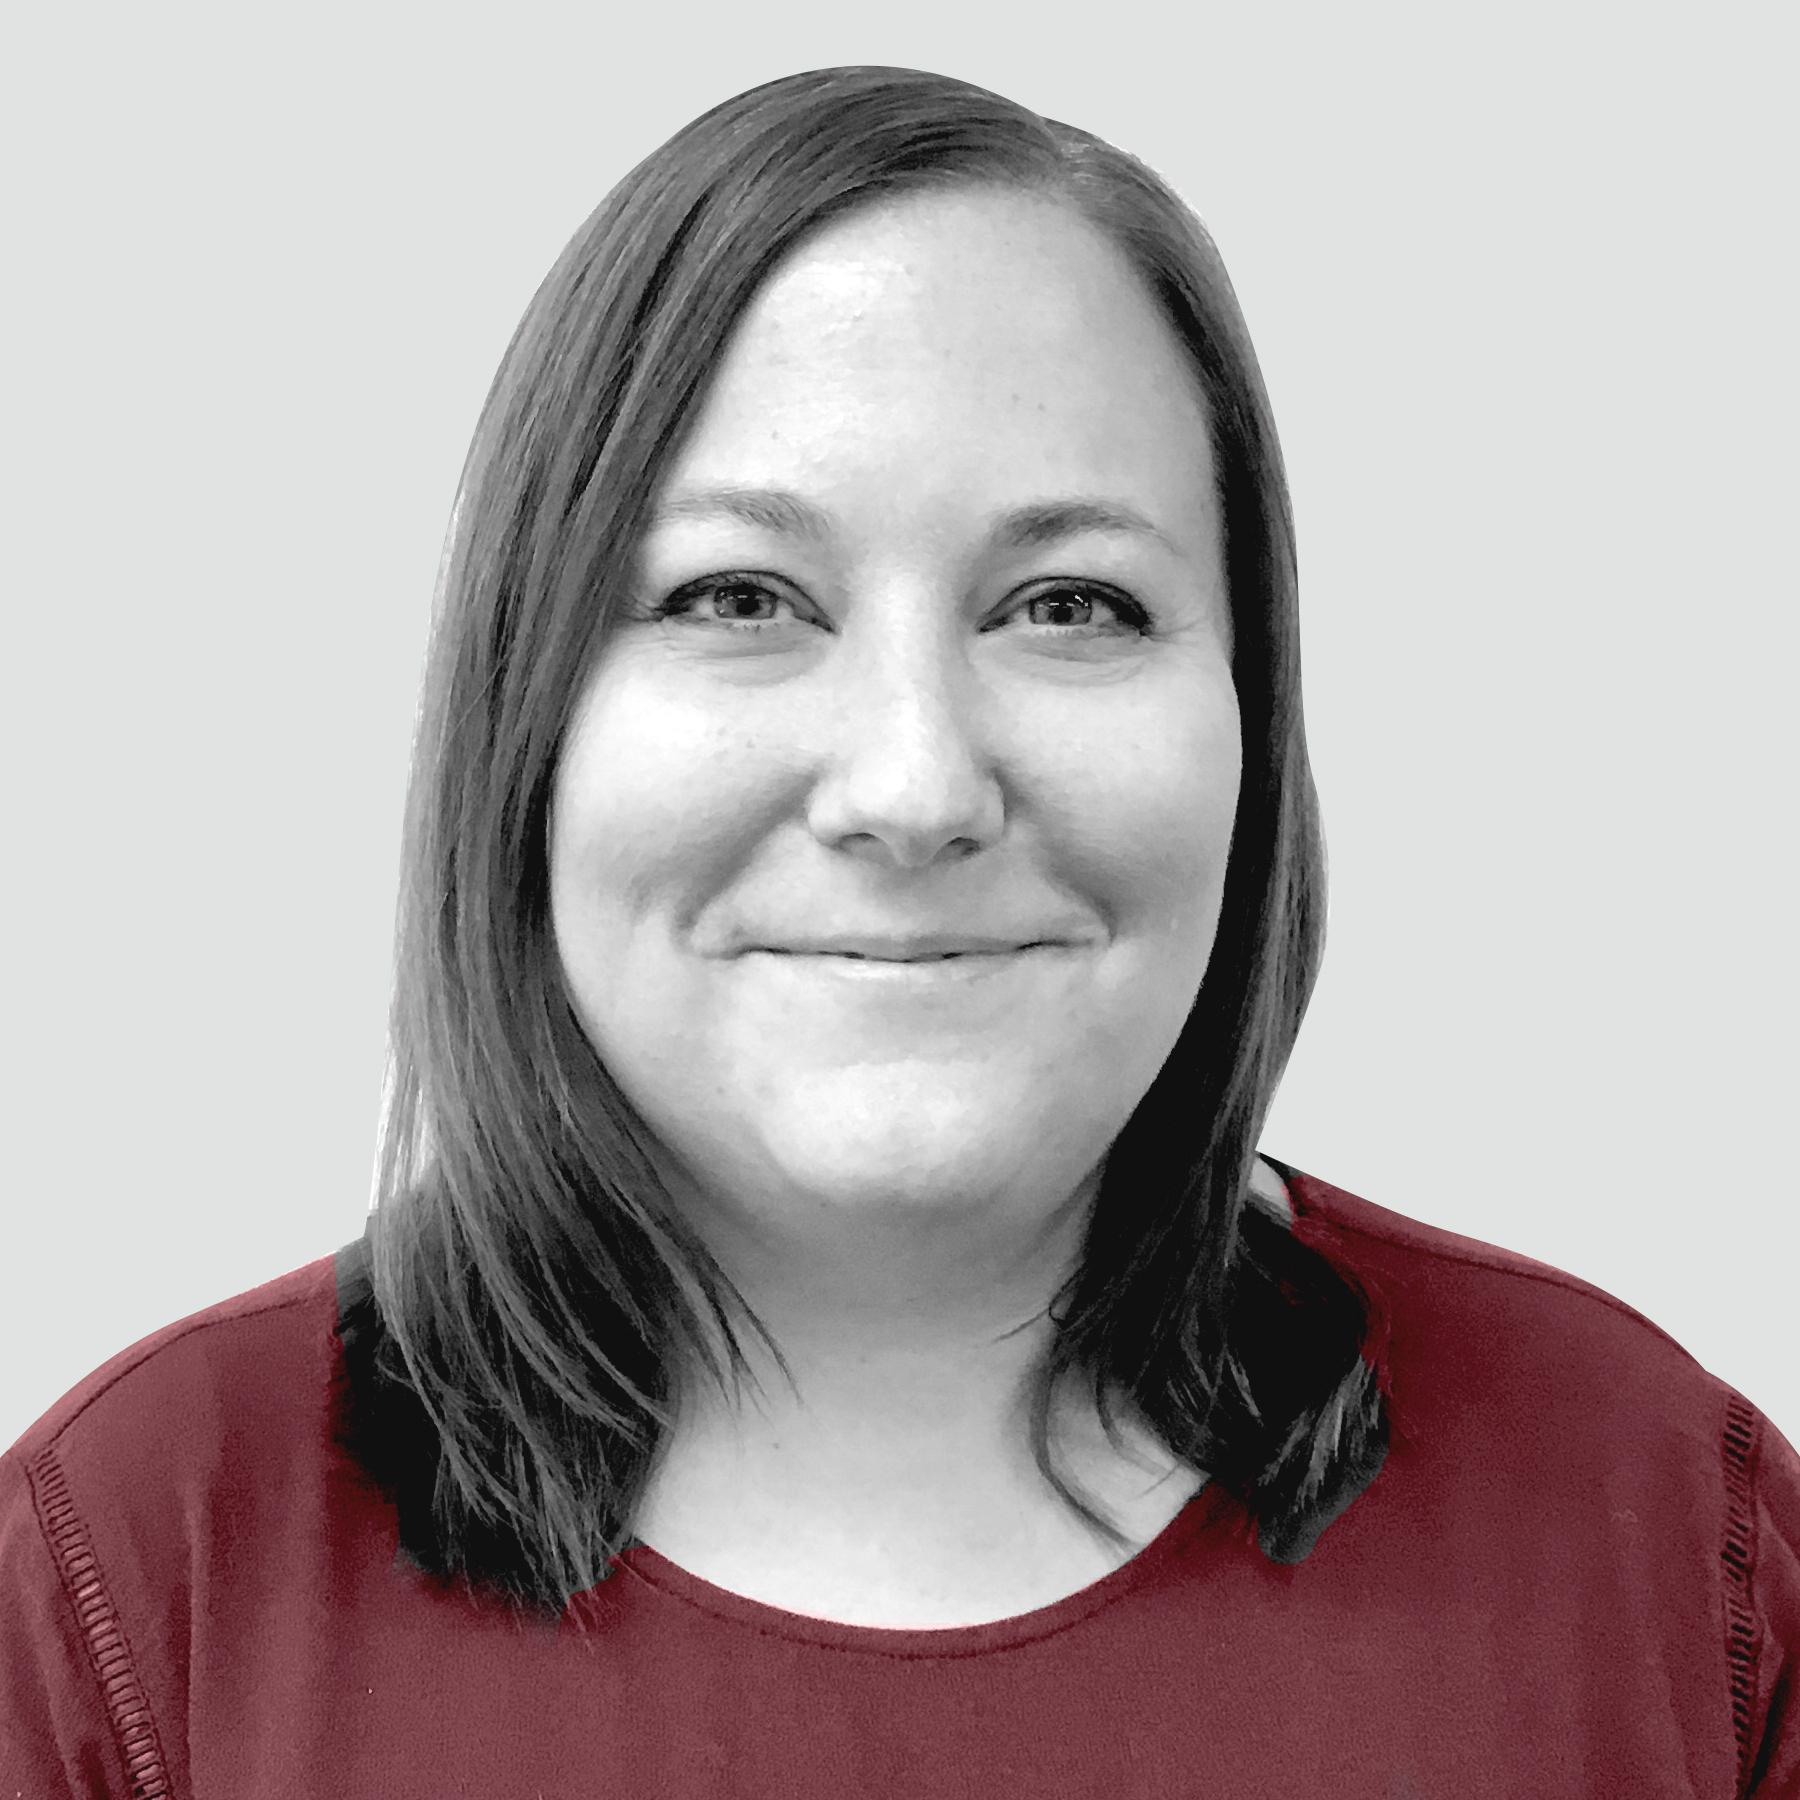 Sara Ziegler